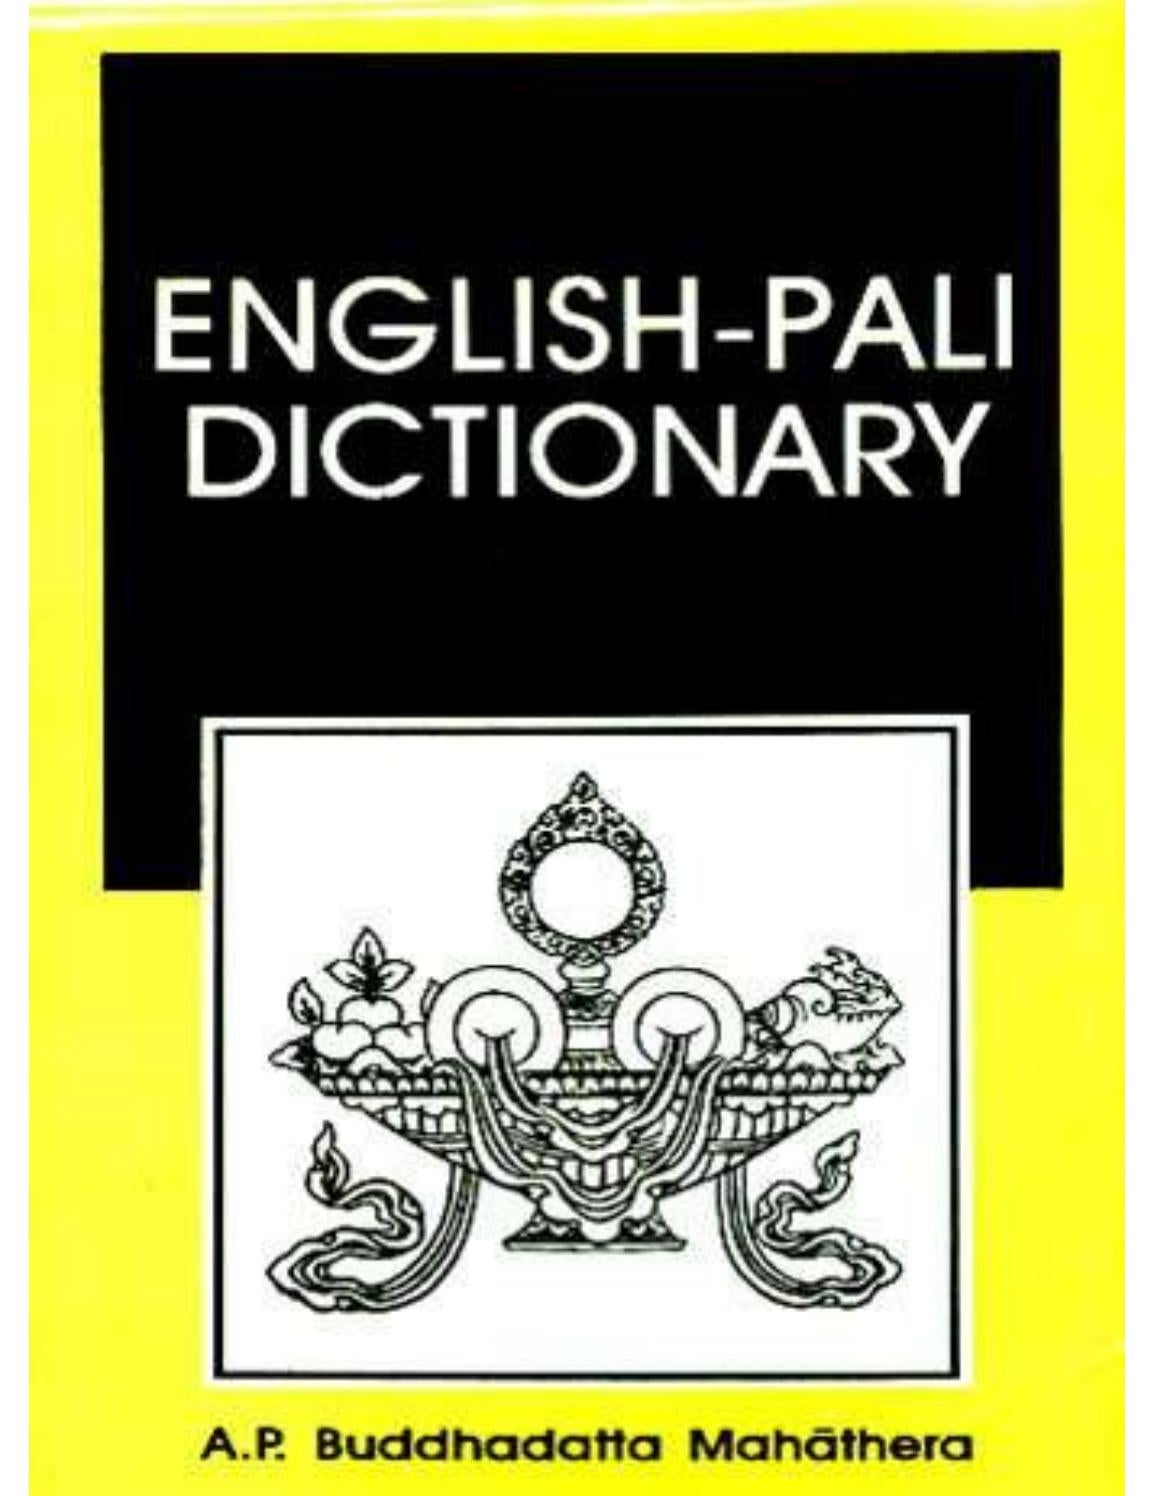 Ananda Mahathera English Pali Dictionary By แดเน ยล Issuu